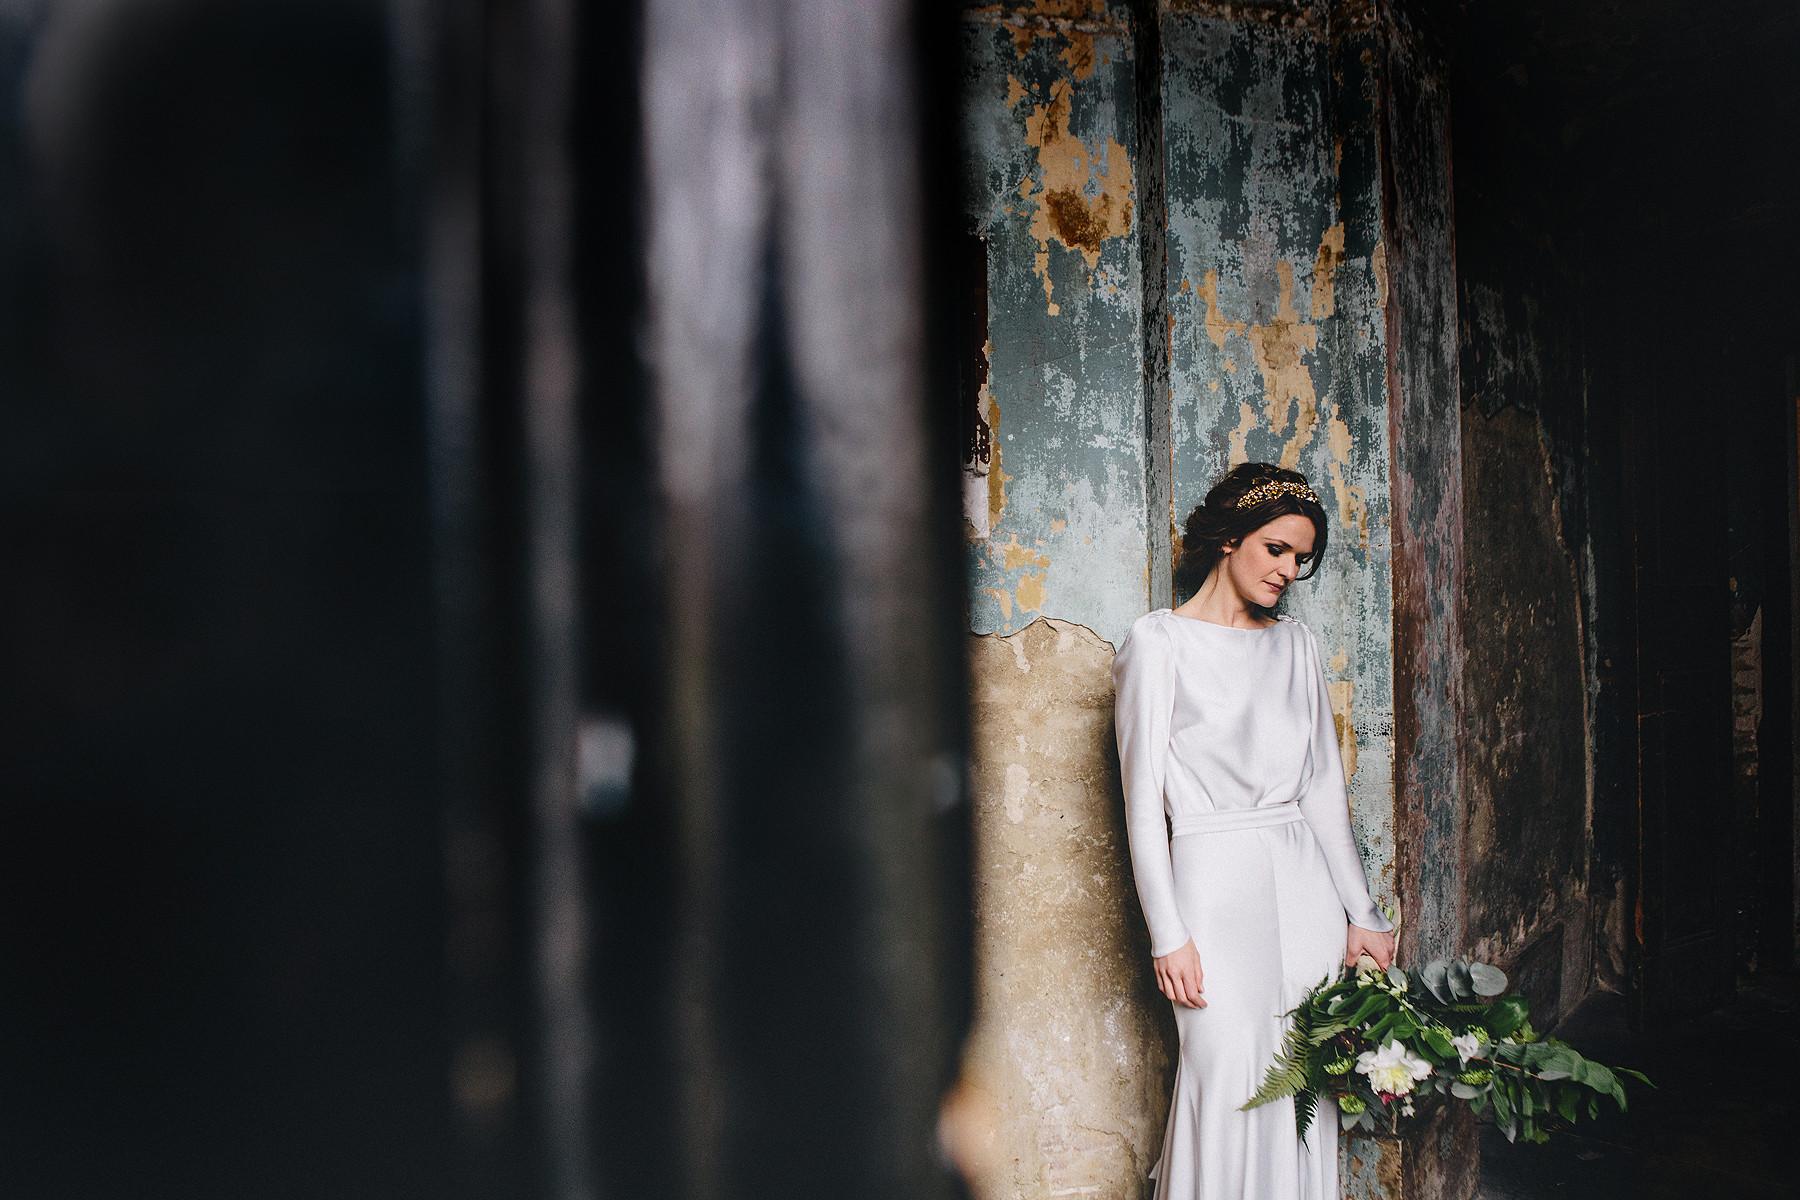 the_asylum_peckham_london_wedding_photography-1800x1200.jpg